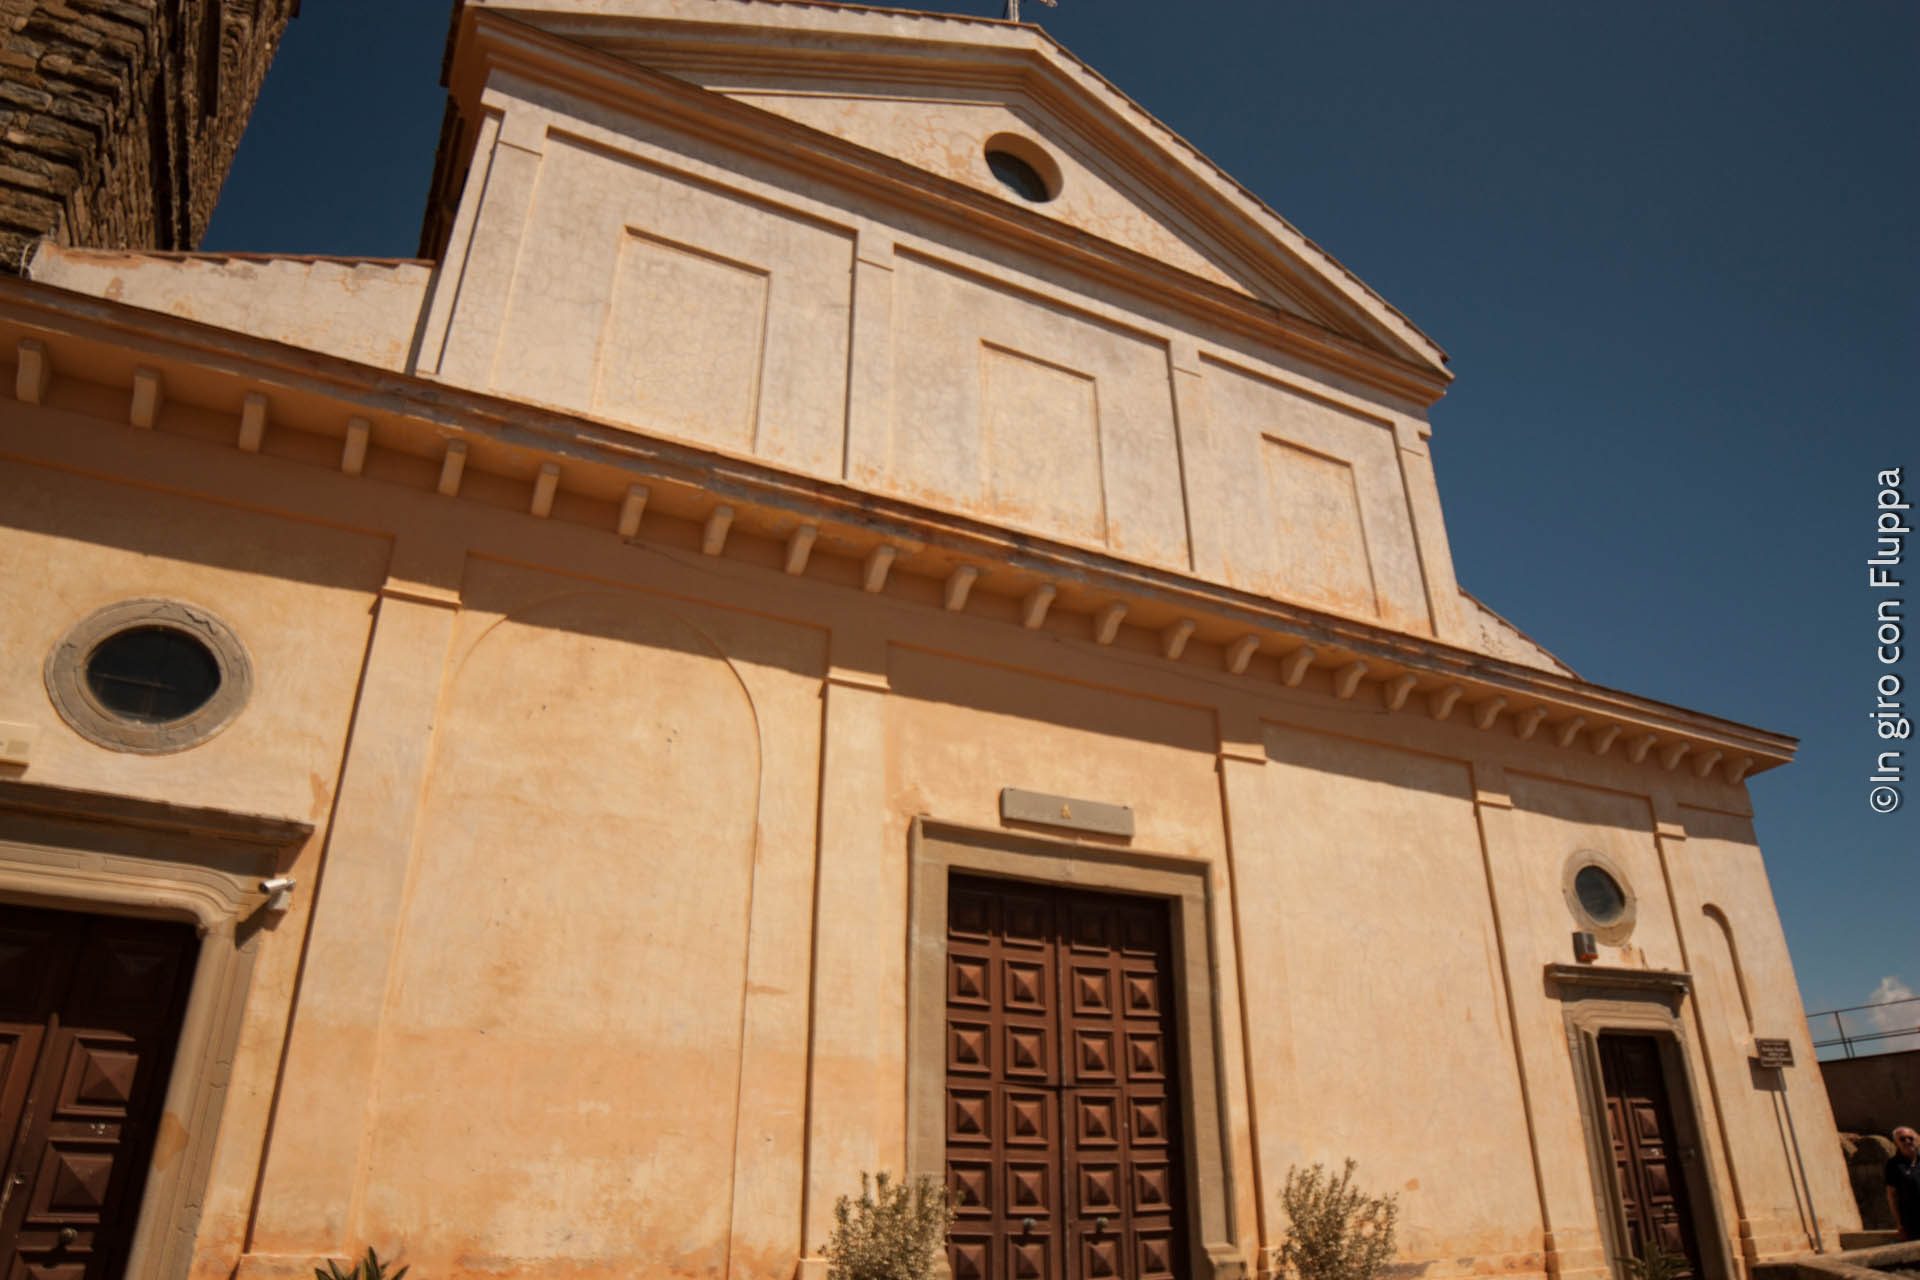 Castellabate - Basilica Pontificia Minore